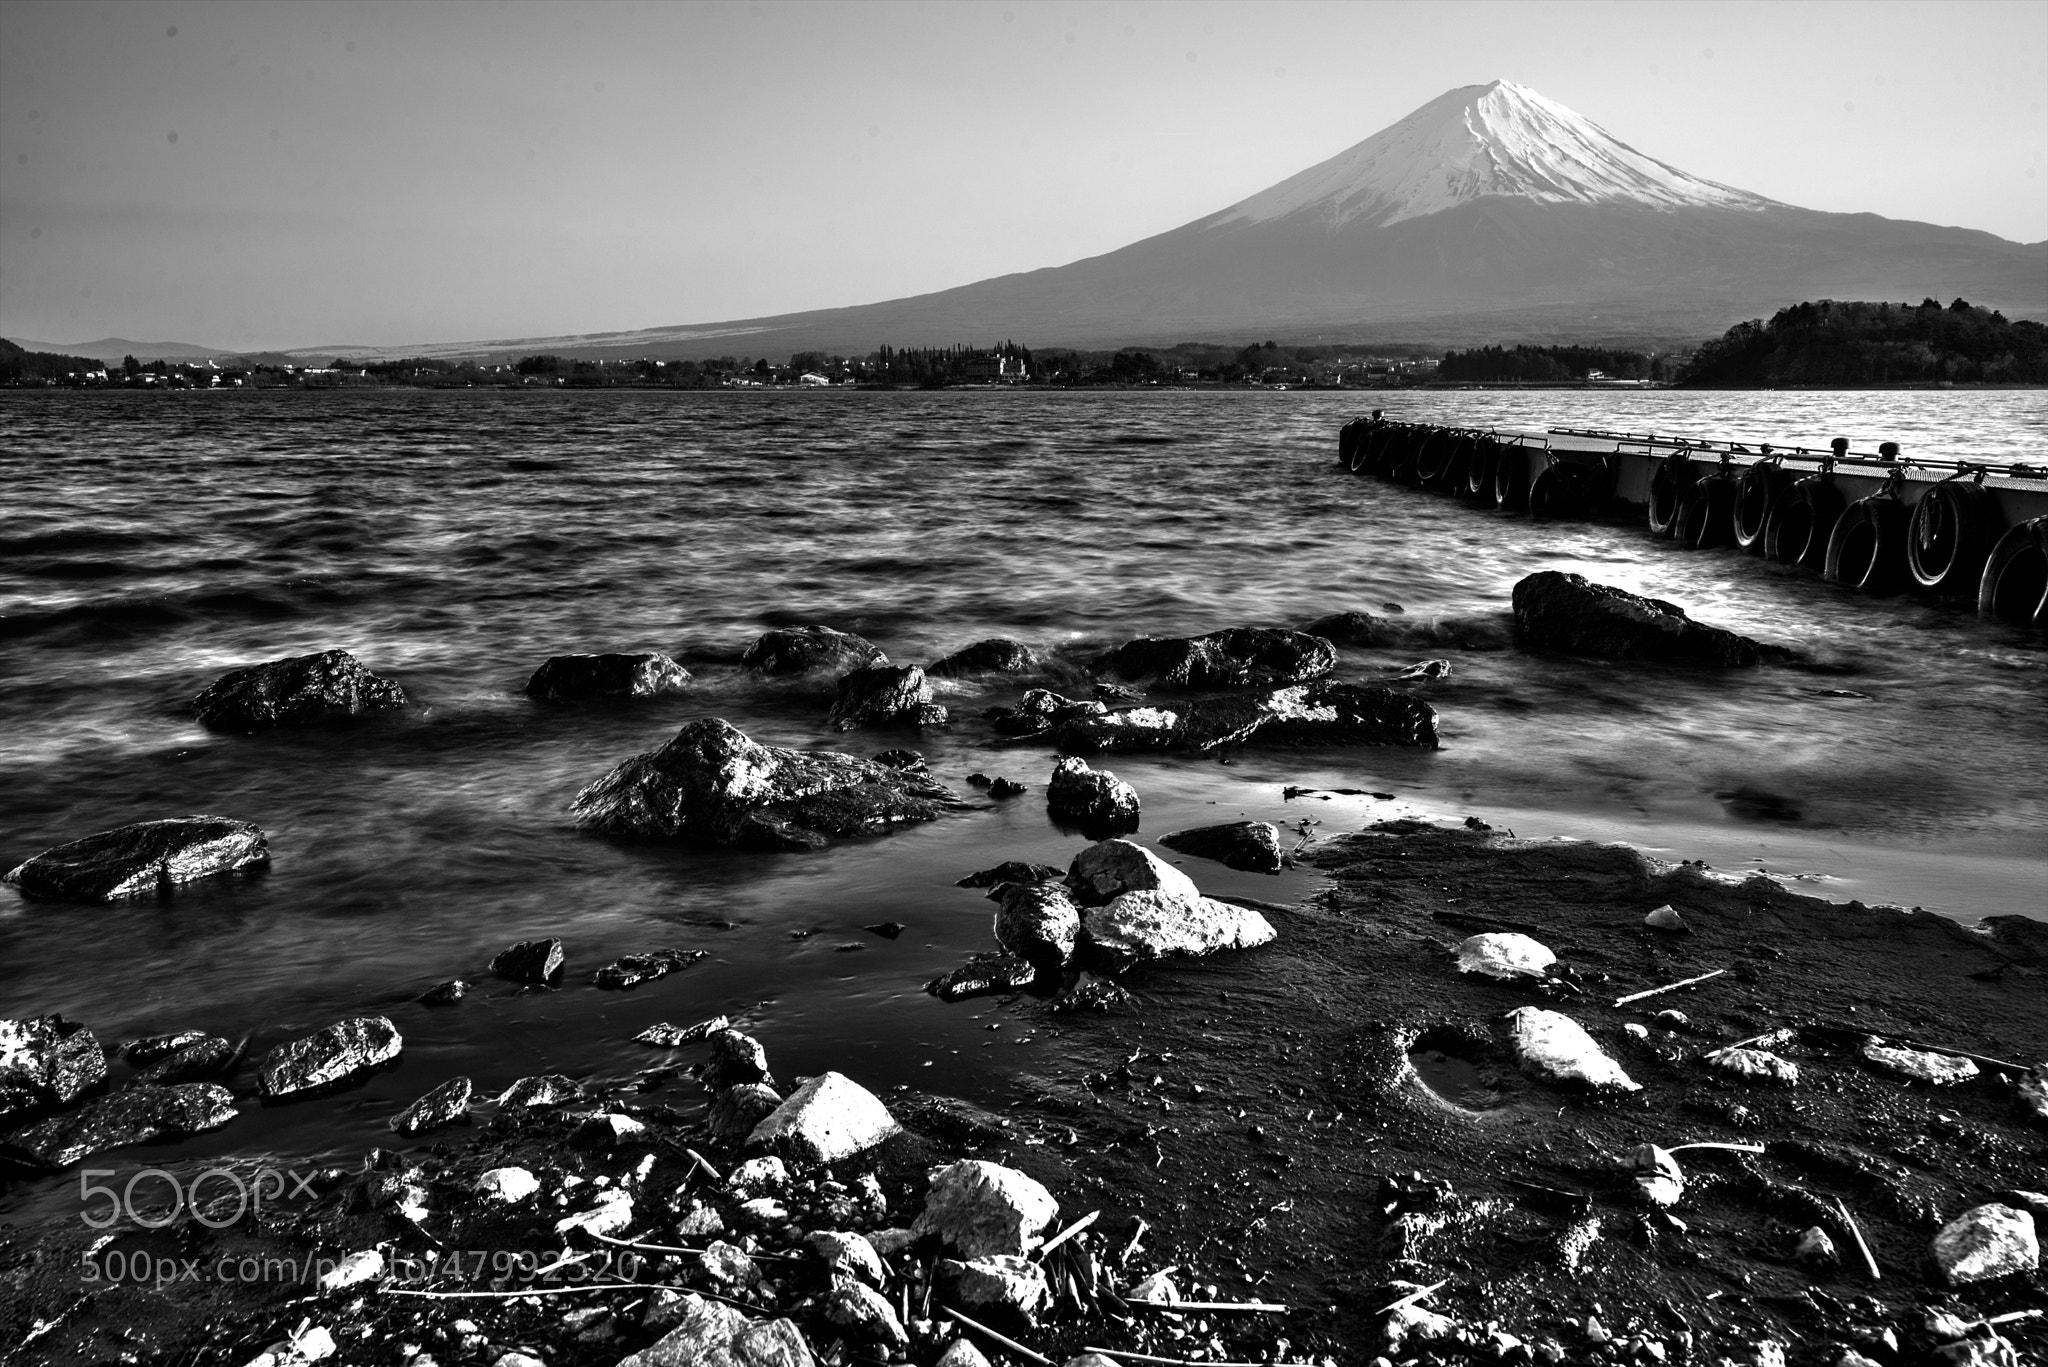 Photograph Mt Fuji Tranquility by hugh dornan on 500px